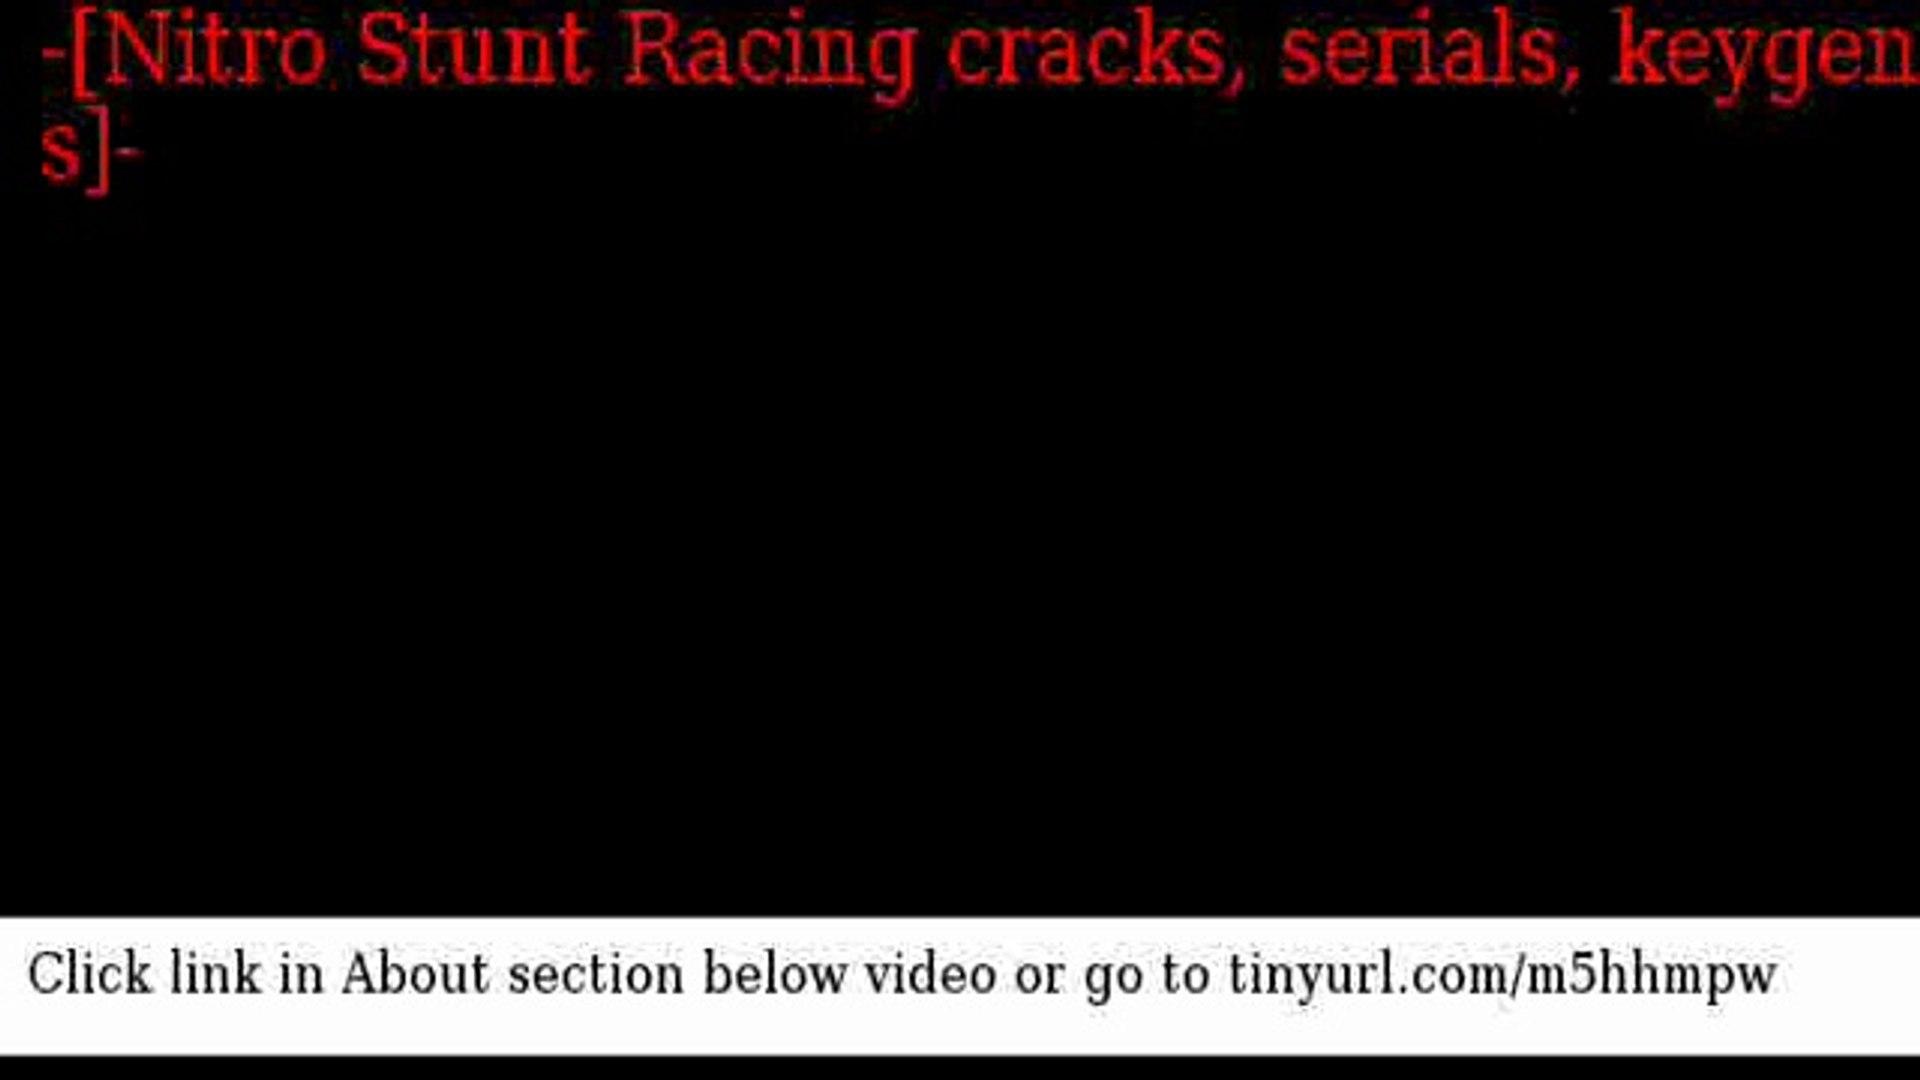 Nitro Stunt Racing cracks serials keygens